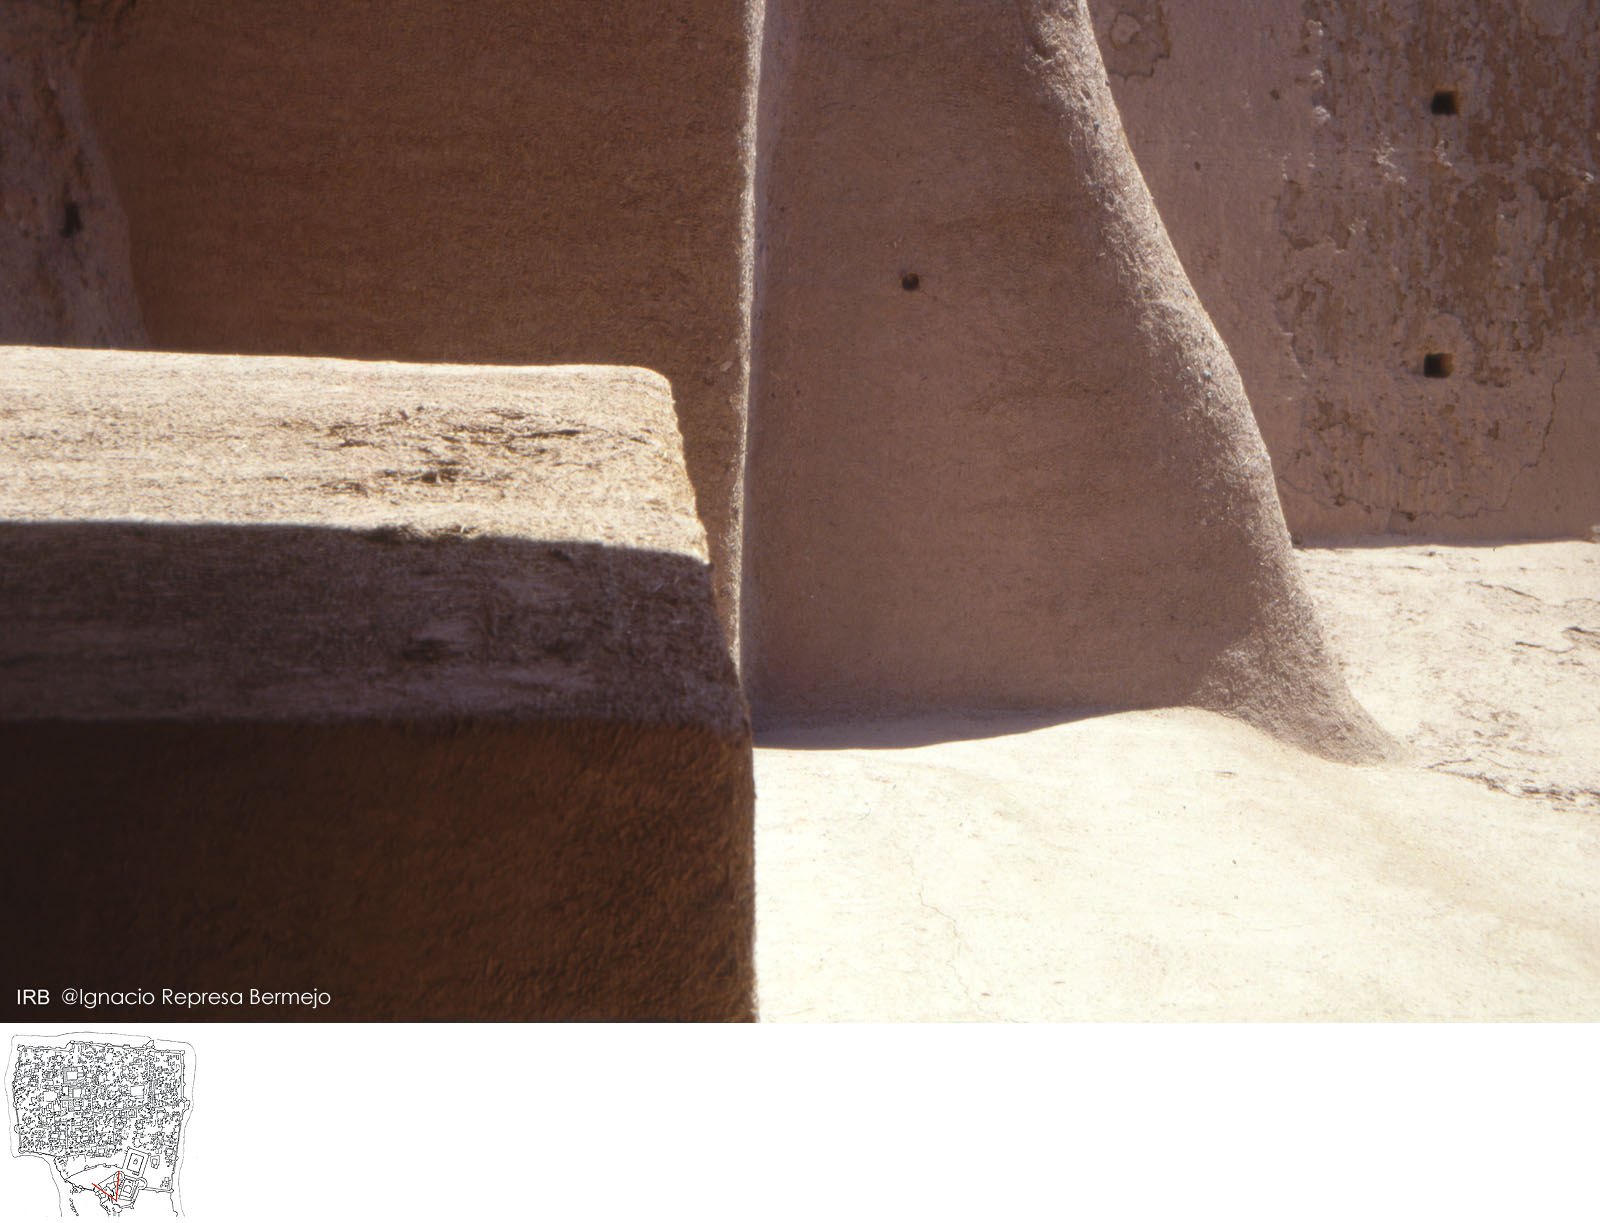 danielvillalobos-architecturalexhibition-bam-architectureofmud-23